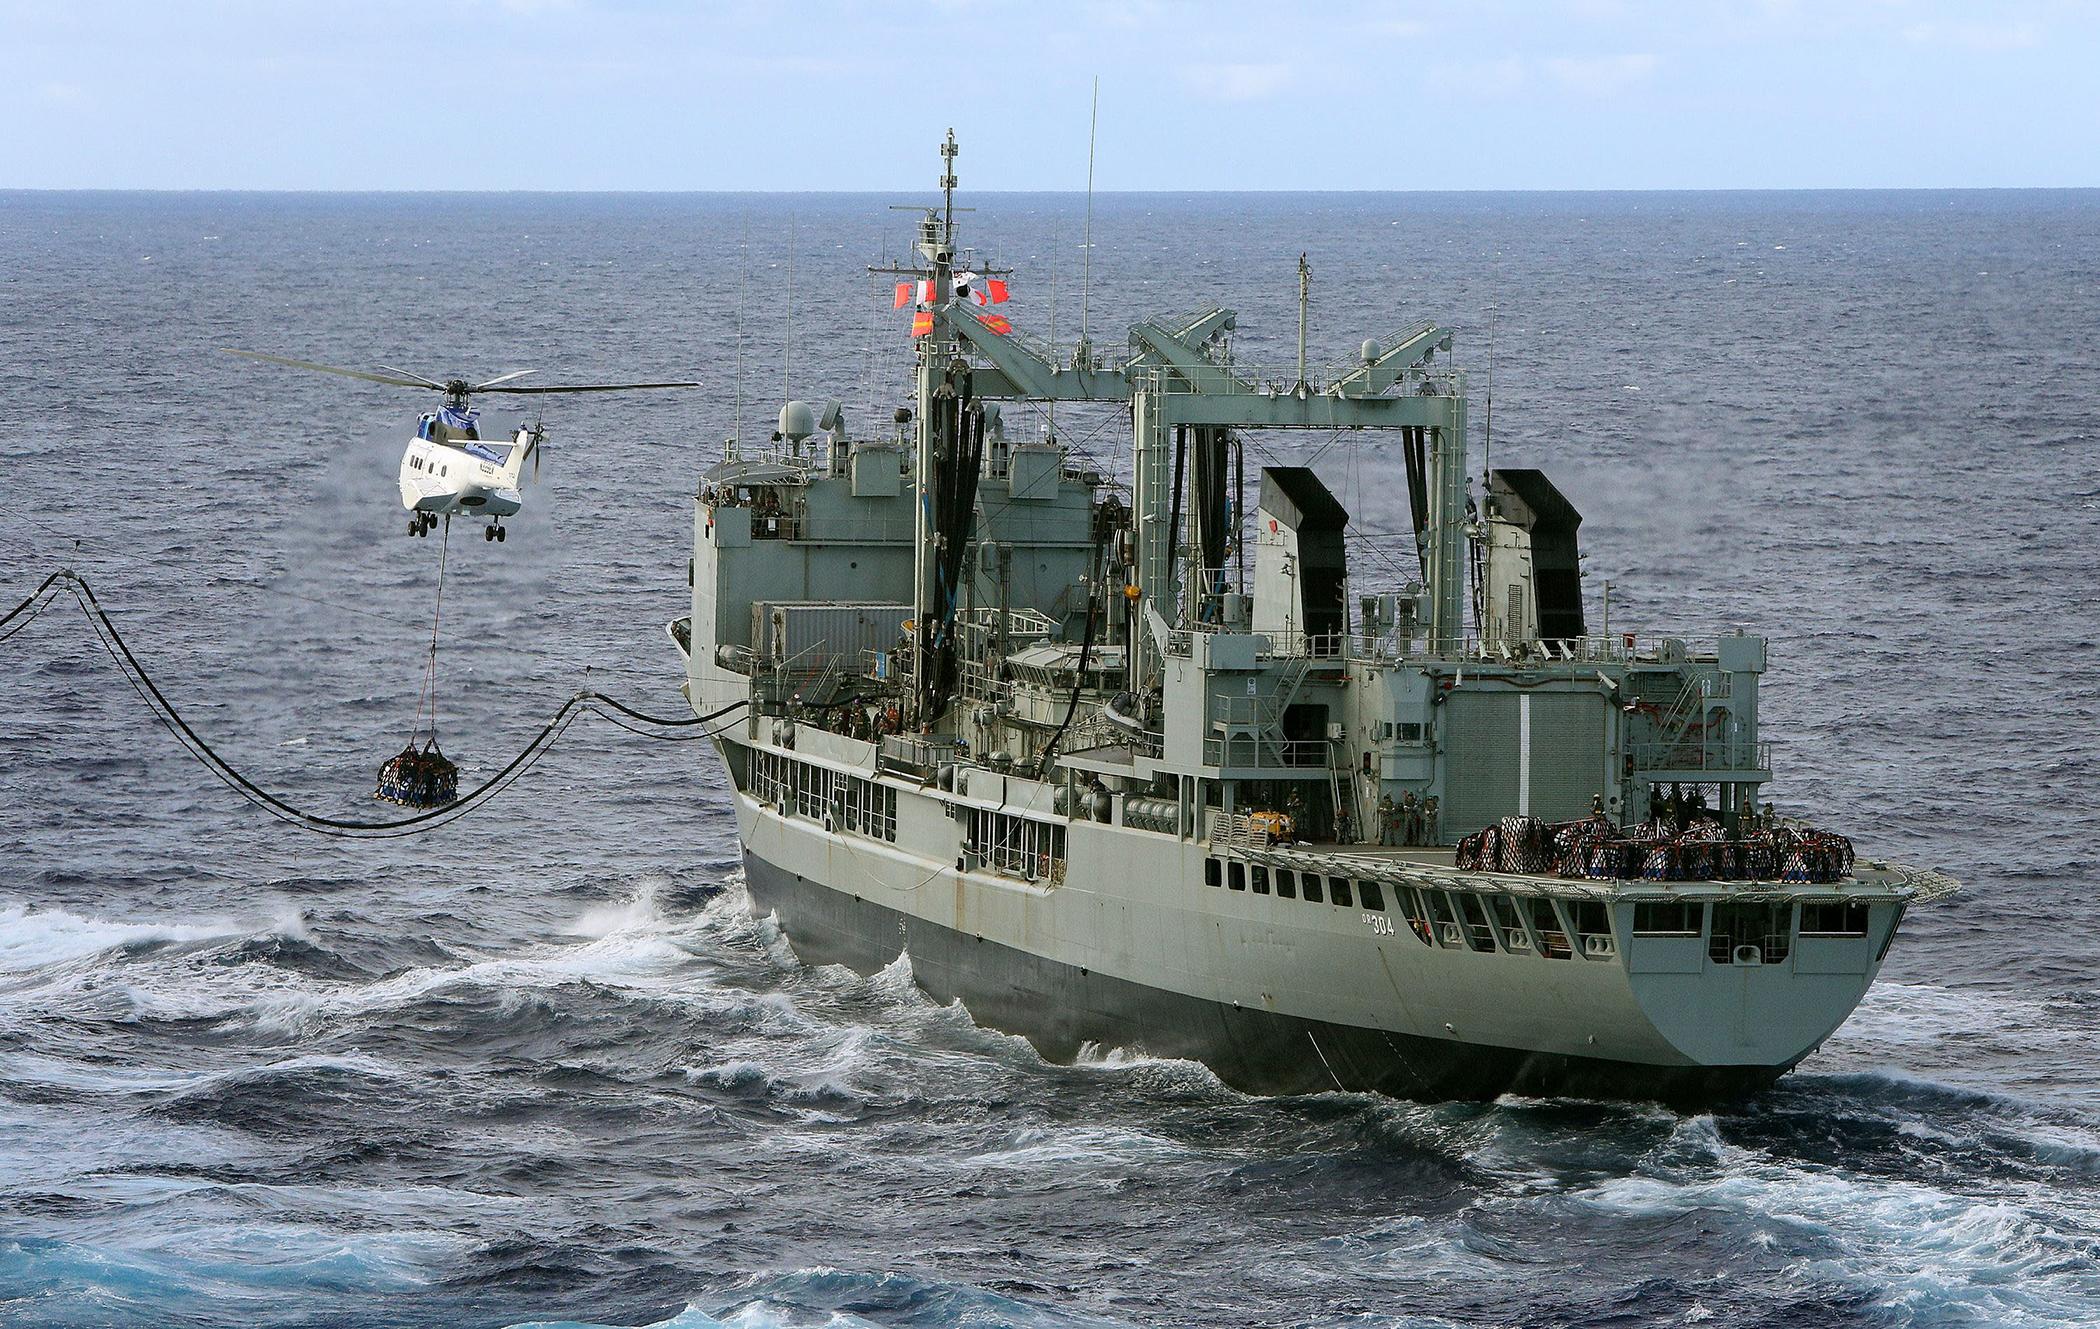 Australia keen to join India, U.S. naval drills